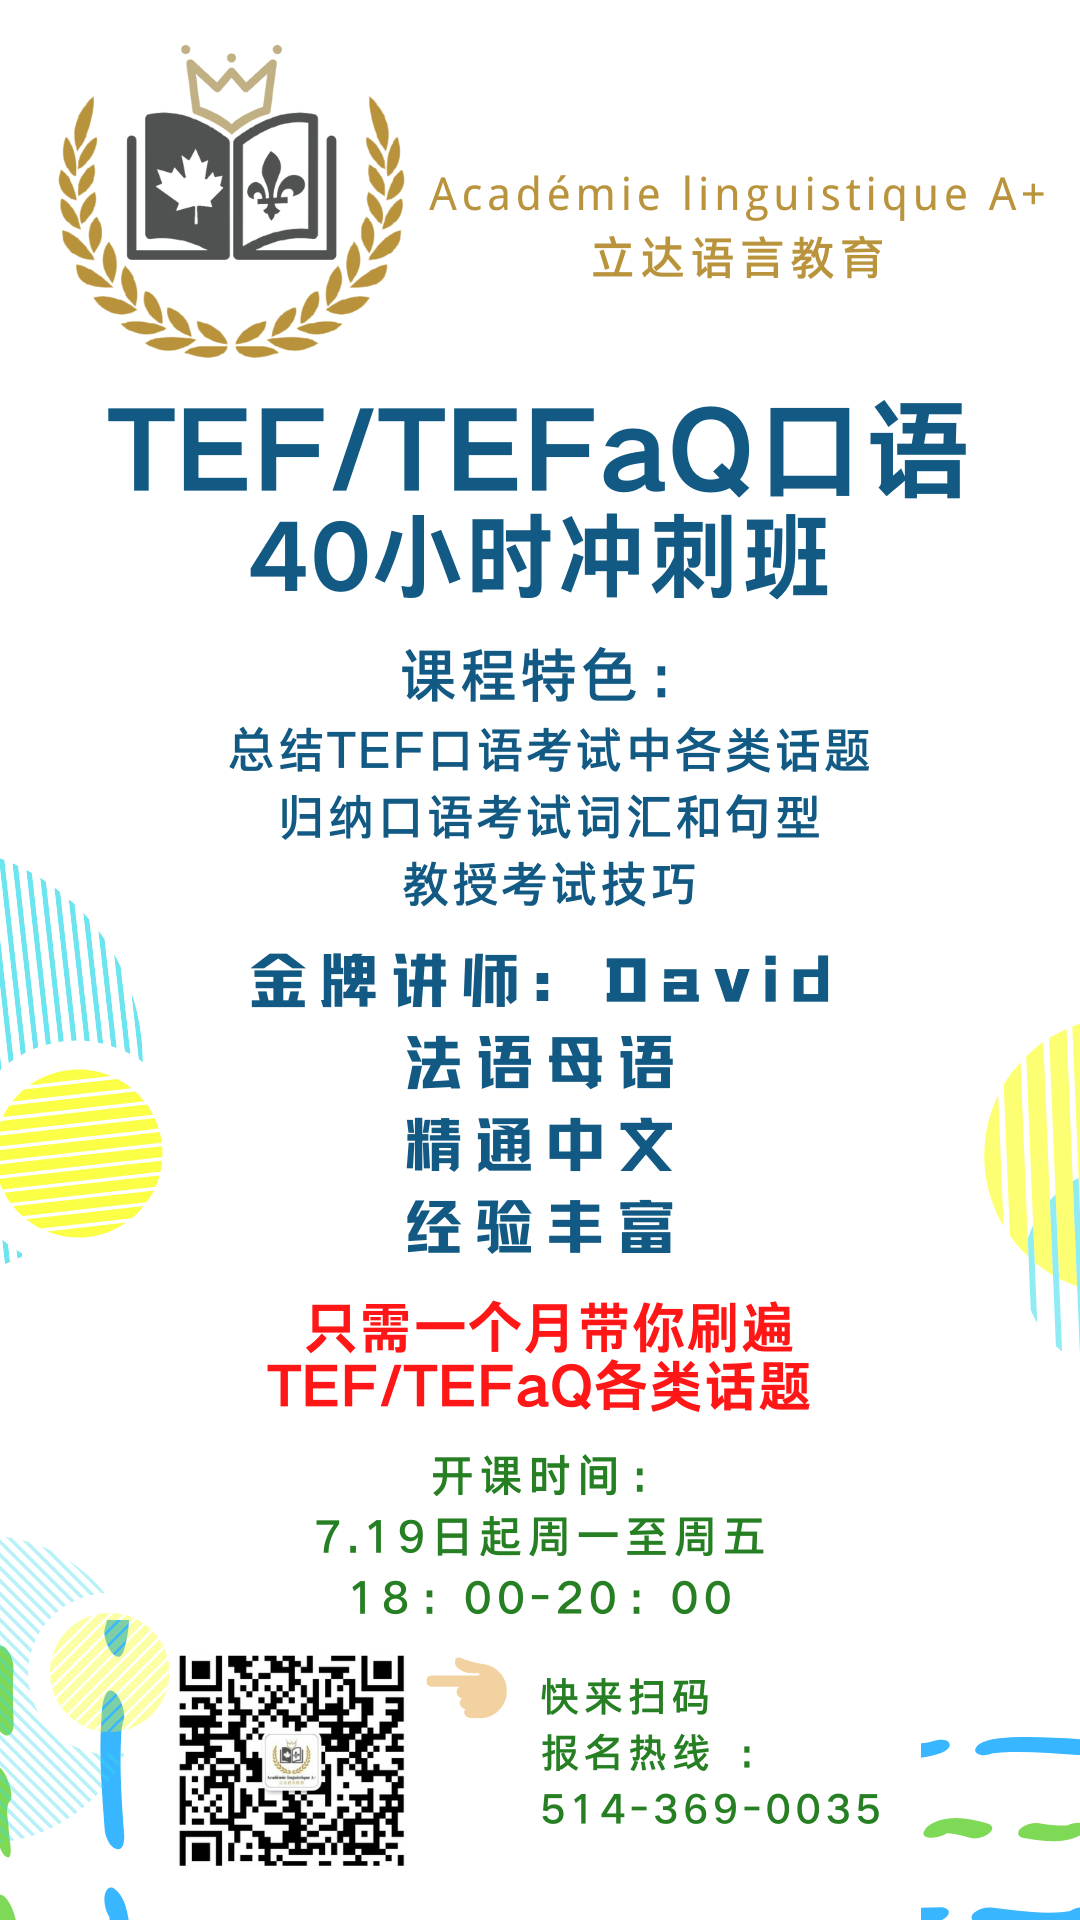 TEF:TEFaQ 口语40小时冲刺班.png